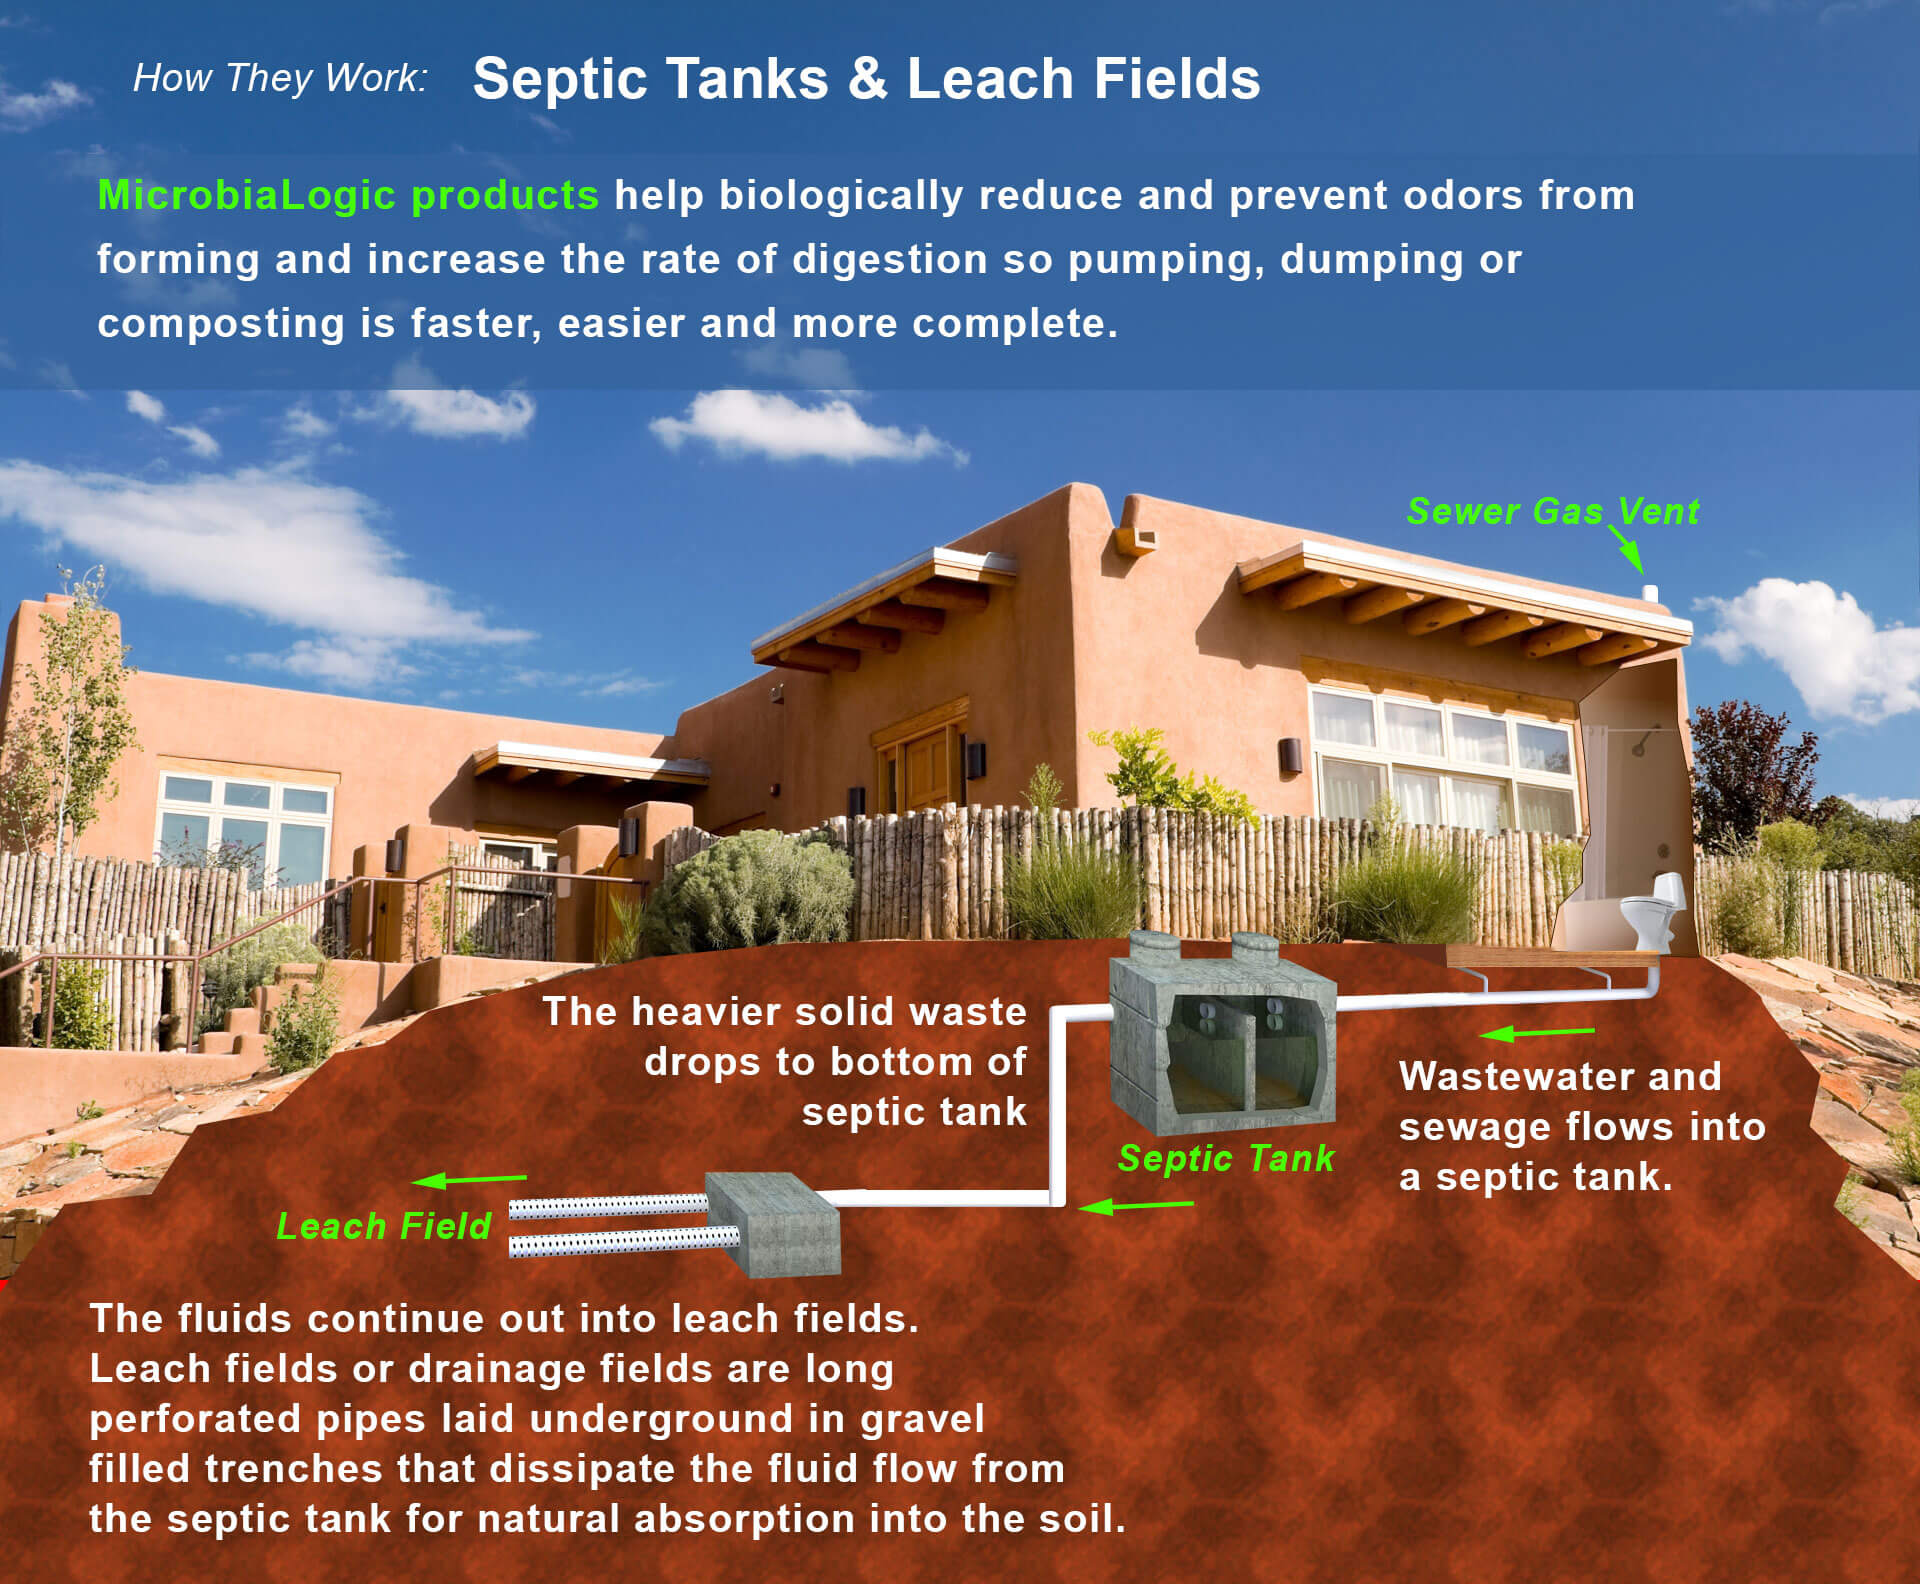 microbialogic-SepticTanks&LeachFields-4